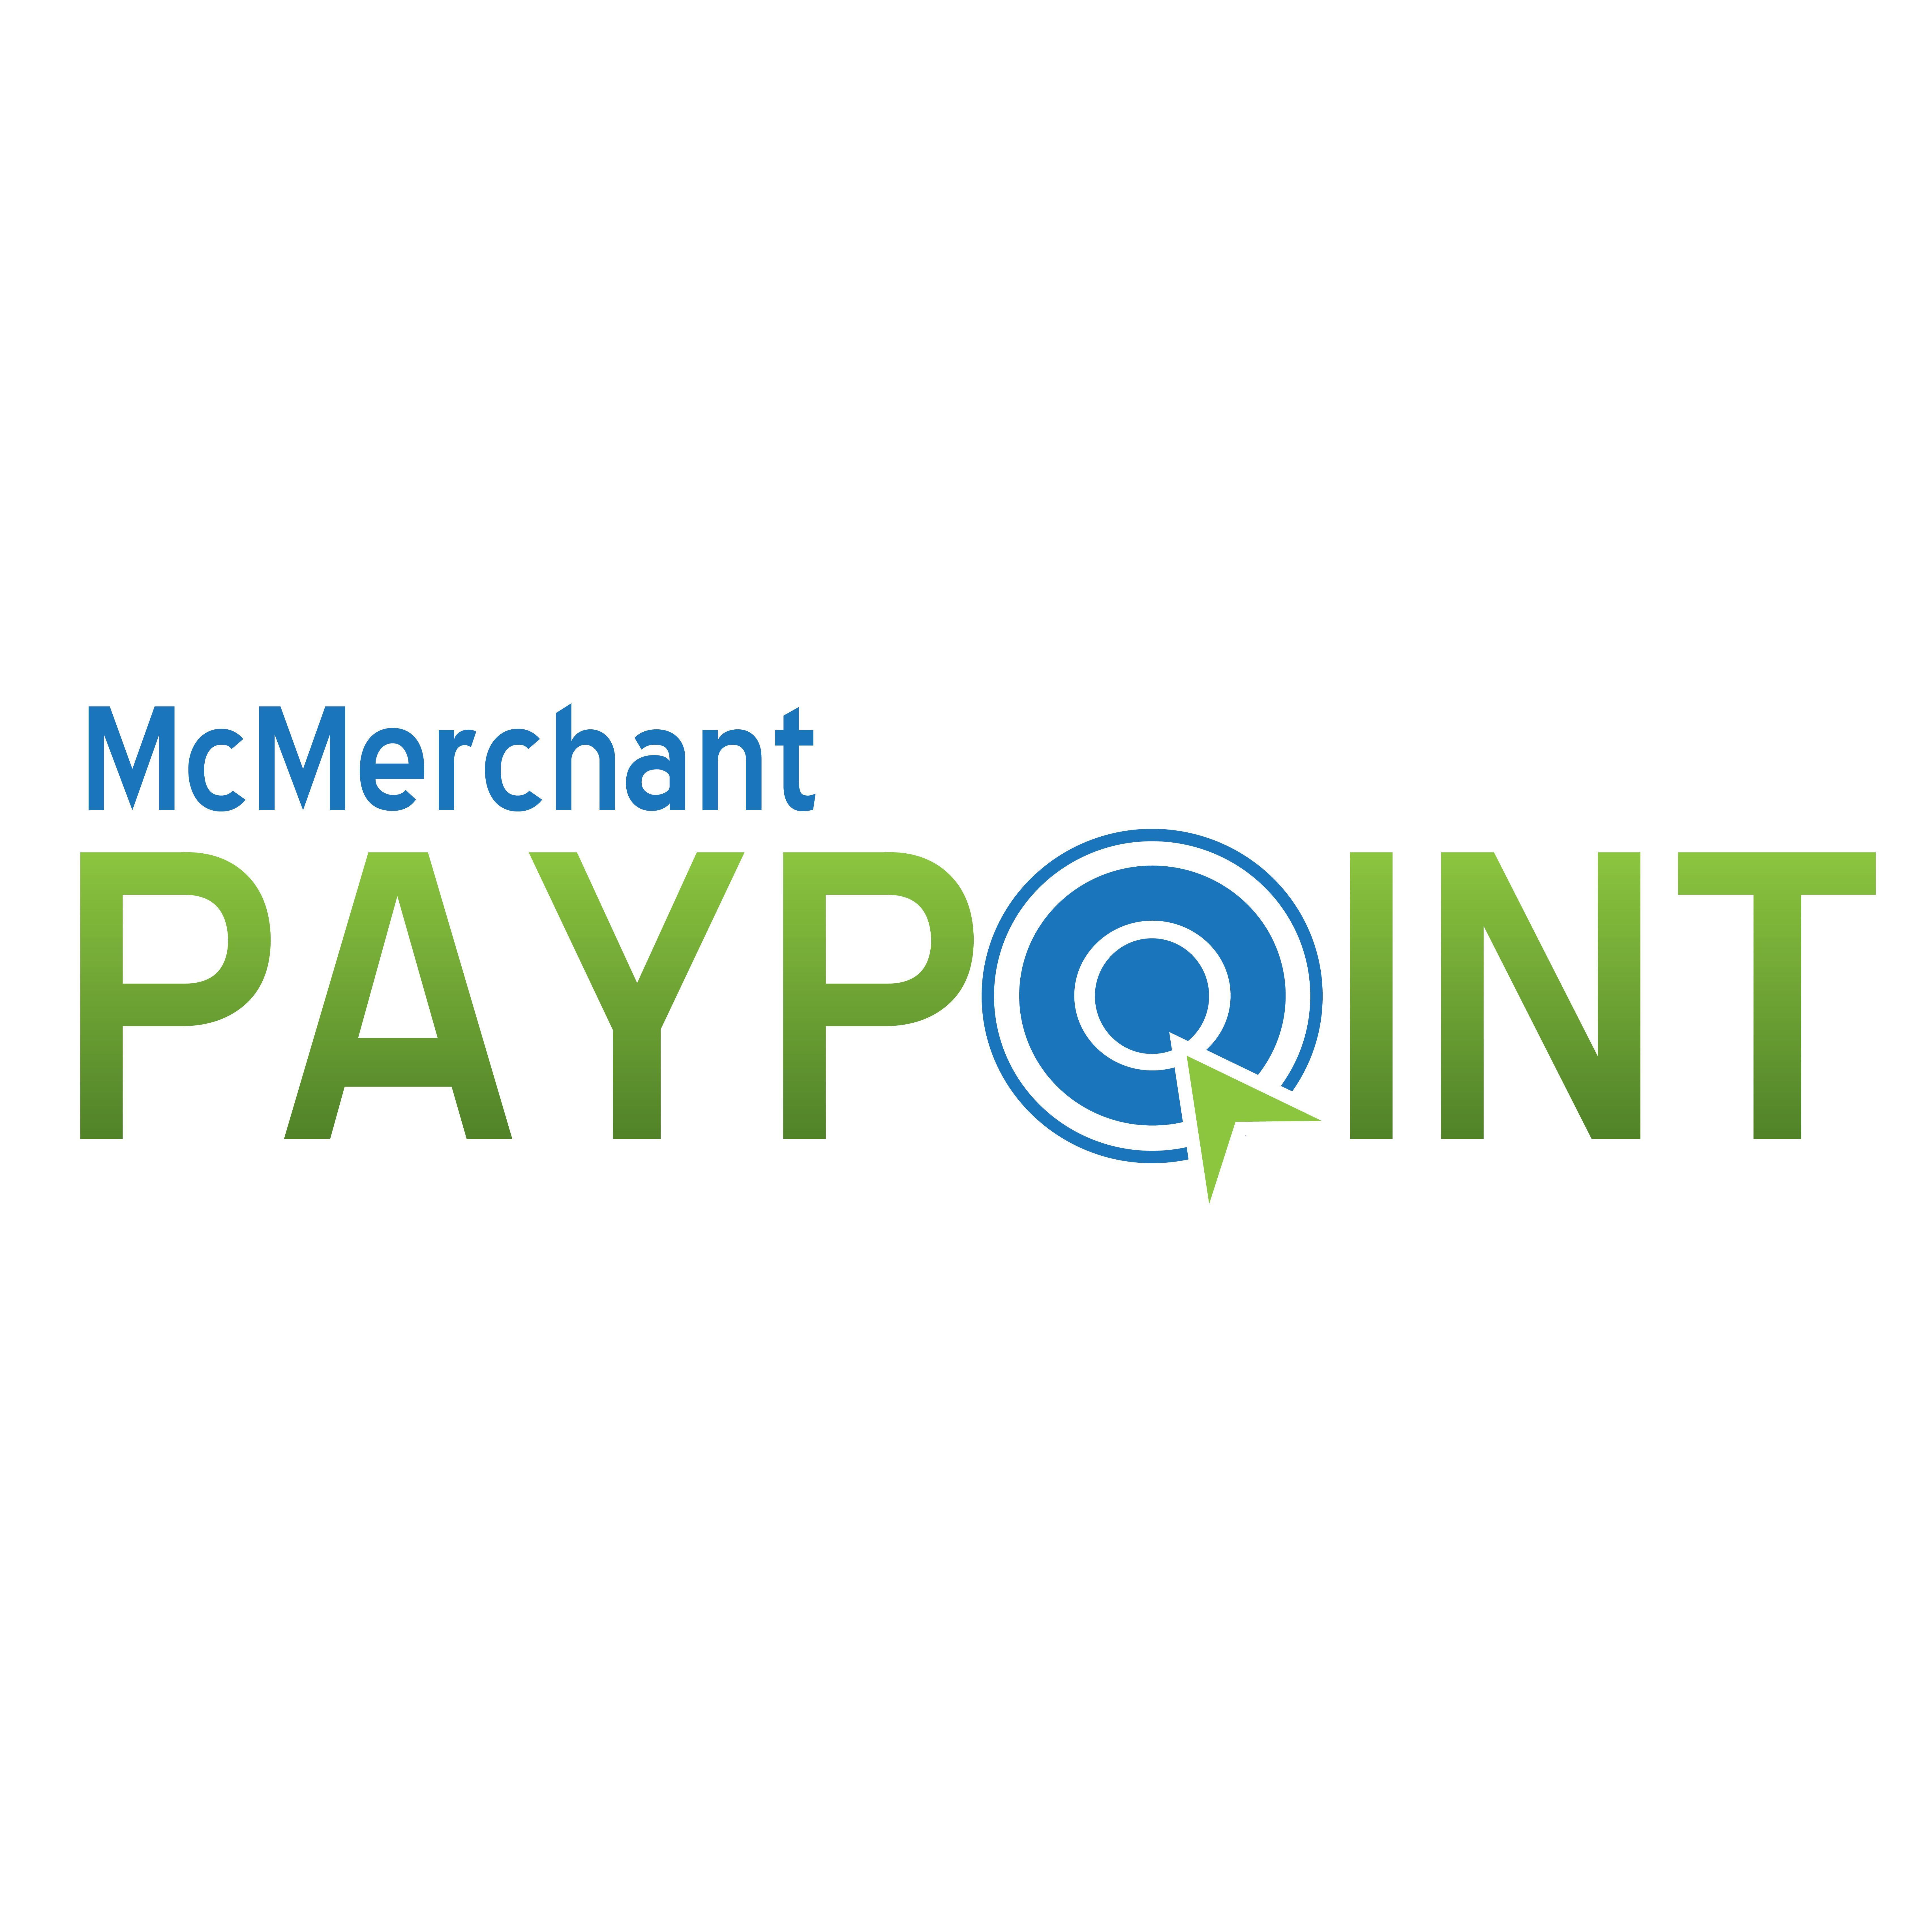 My Carolina Merchant Pay Point L.L.C.